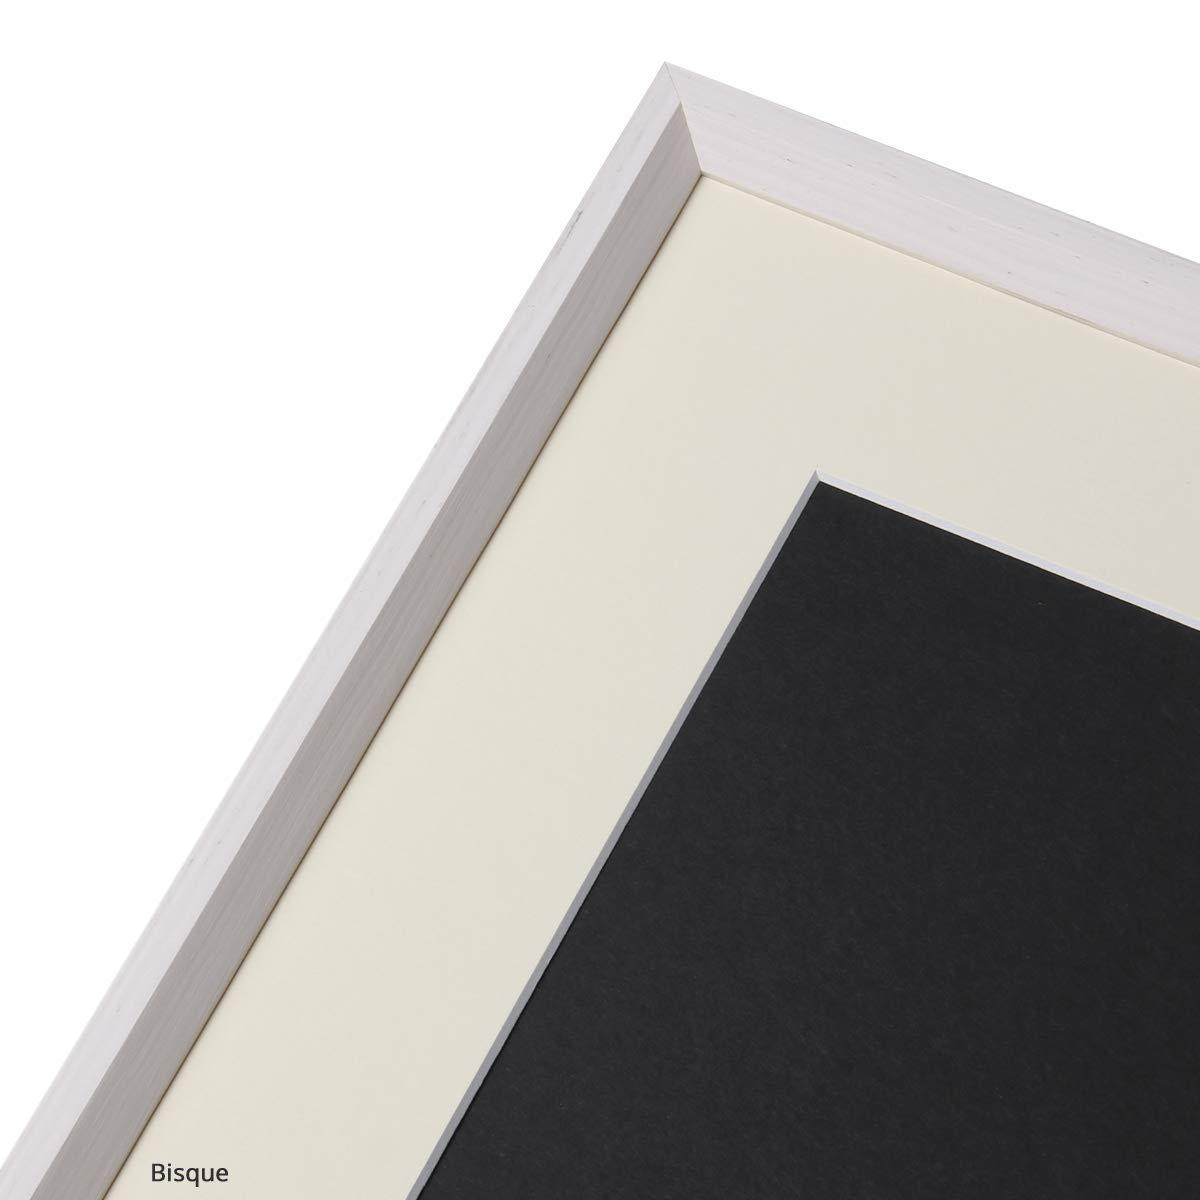 ASP-Galeriebedarf Fertig-Passepartout 30 x 40 cm f/ür Bildformat 20 x 30 cm Farbe: Bisque 1,4 mm